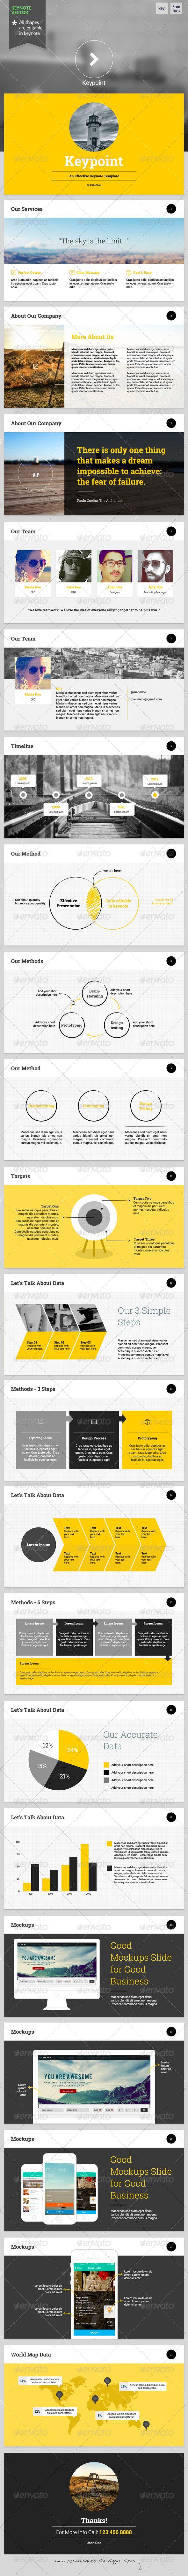 Keypoint - Keynote Template - Keynote Templates Presentation Templates